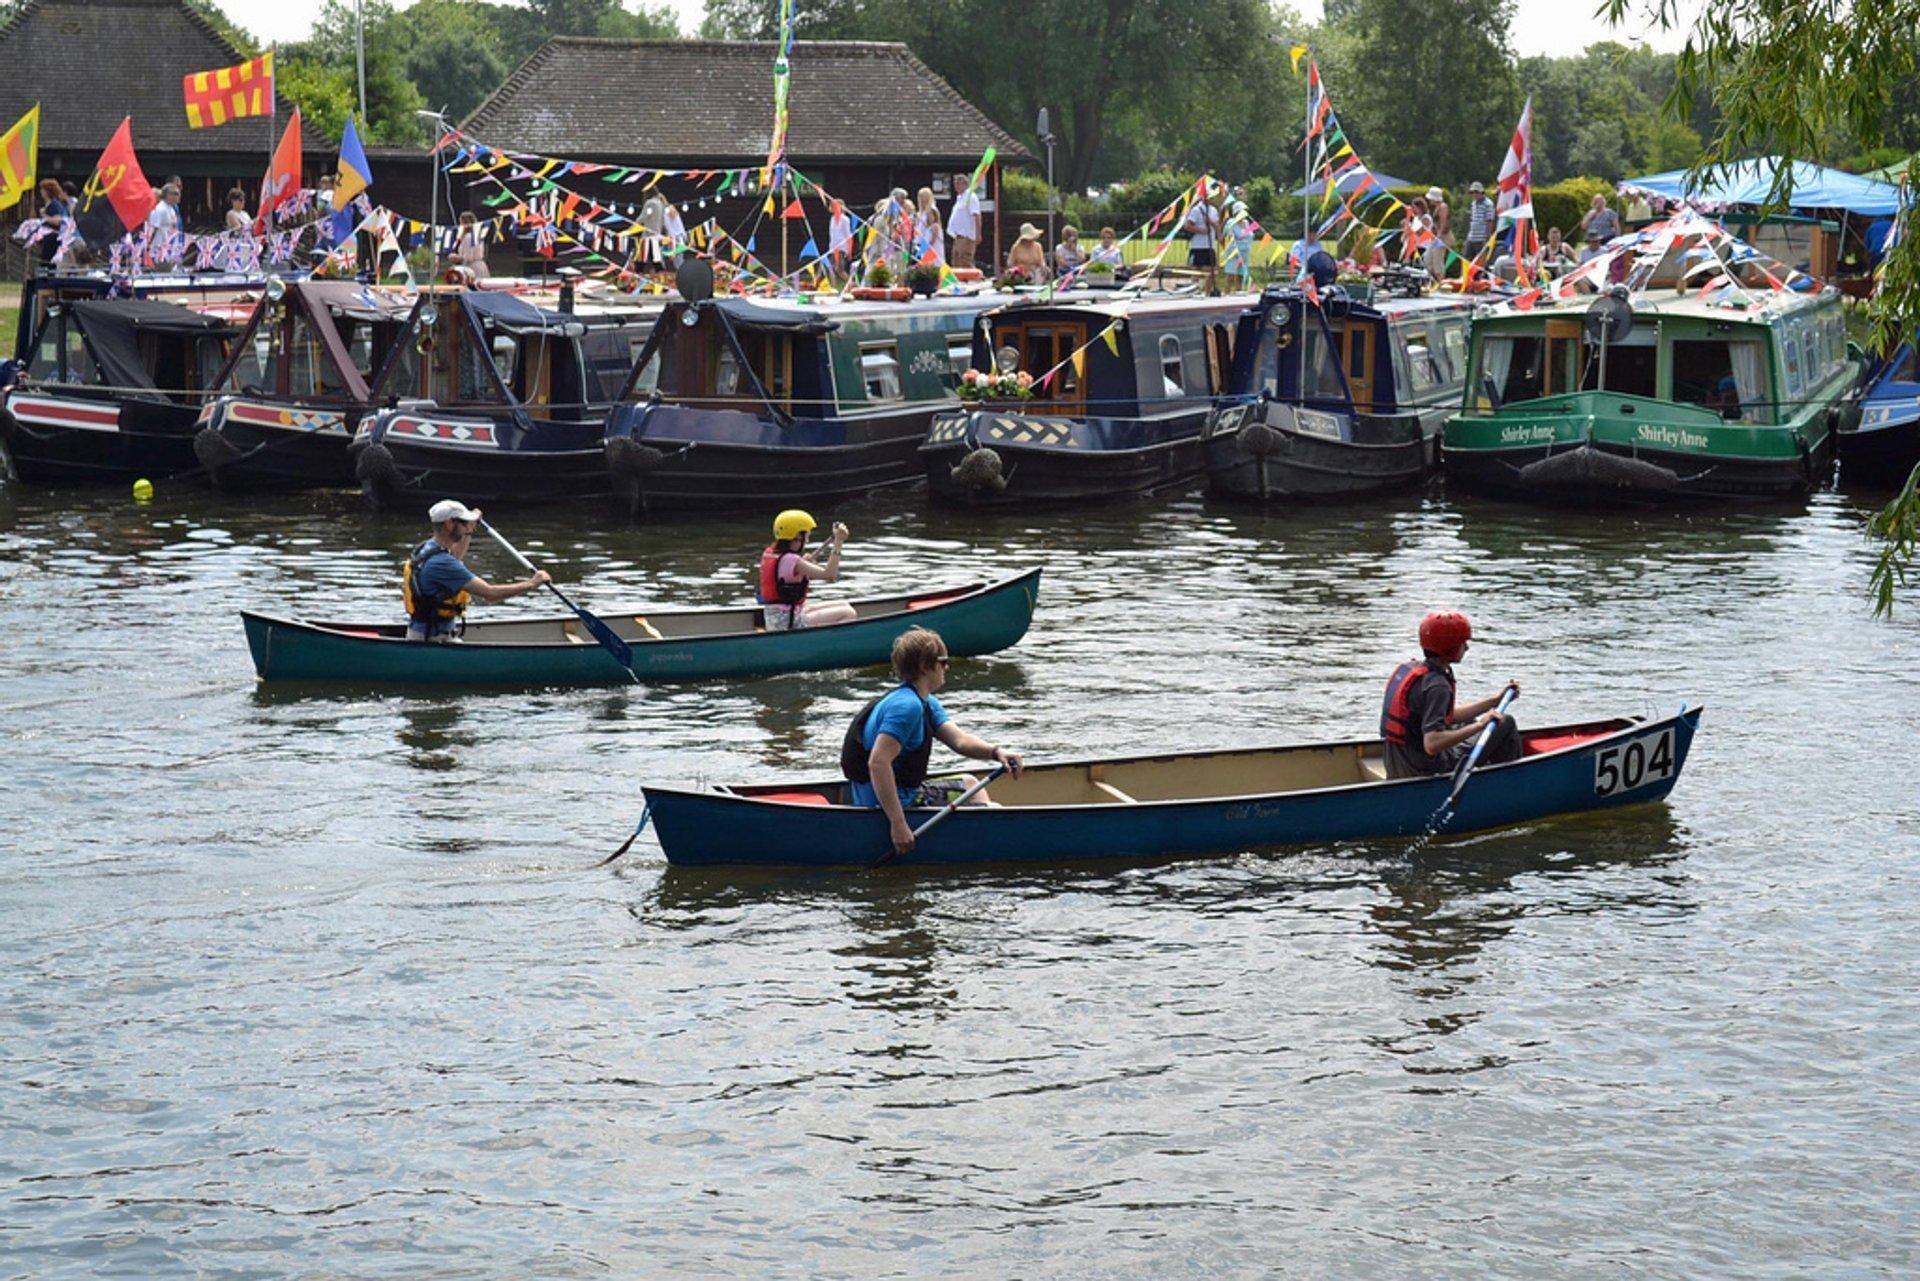 Stratford River Festival  in England - Best Season 2019